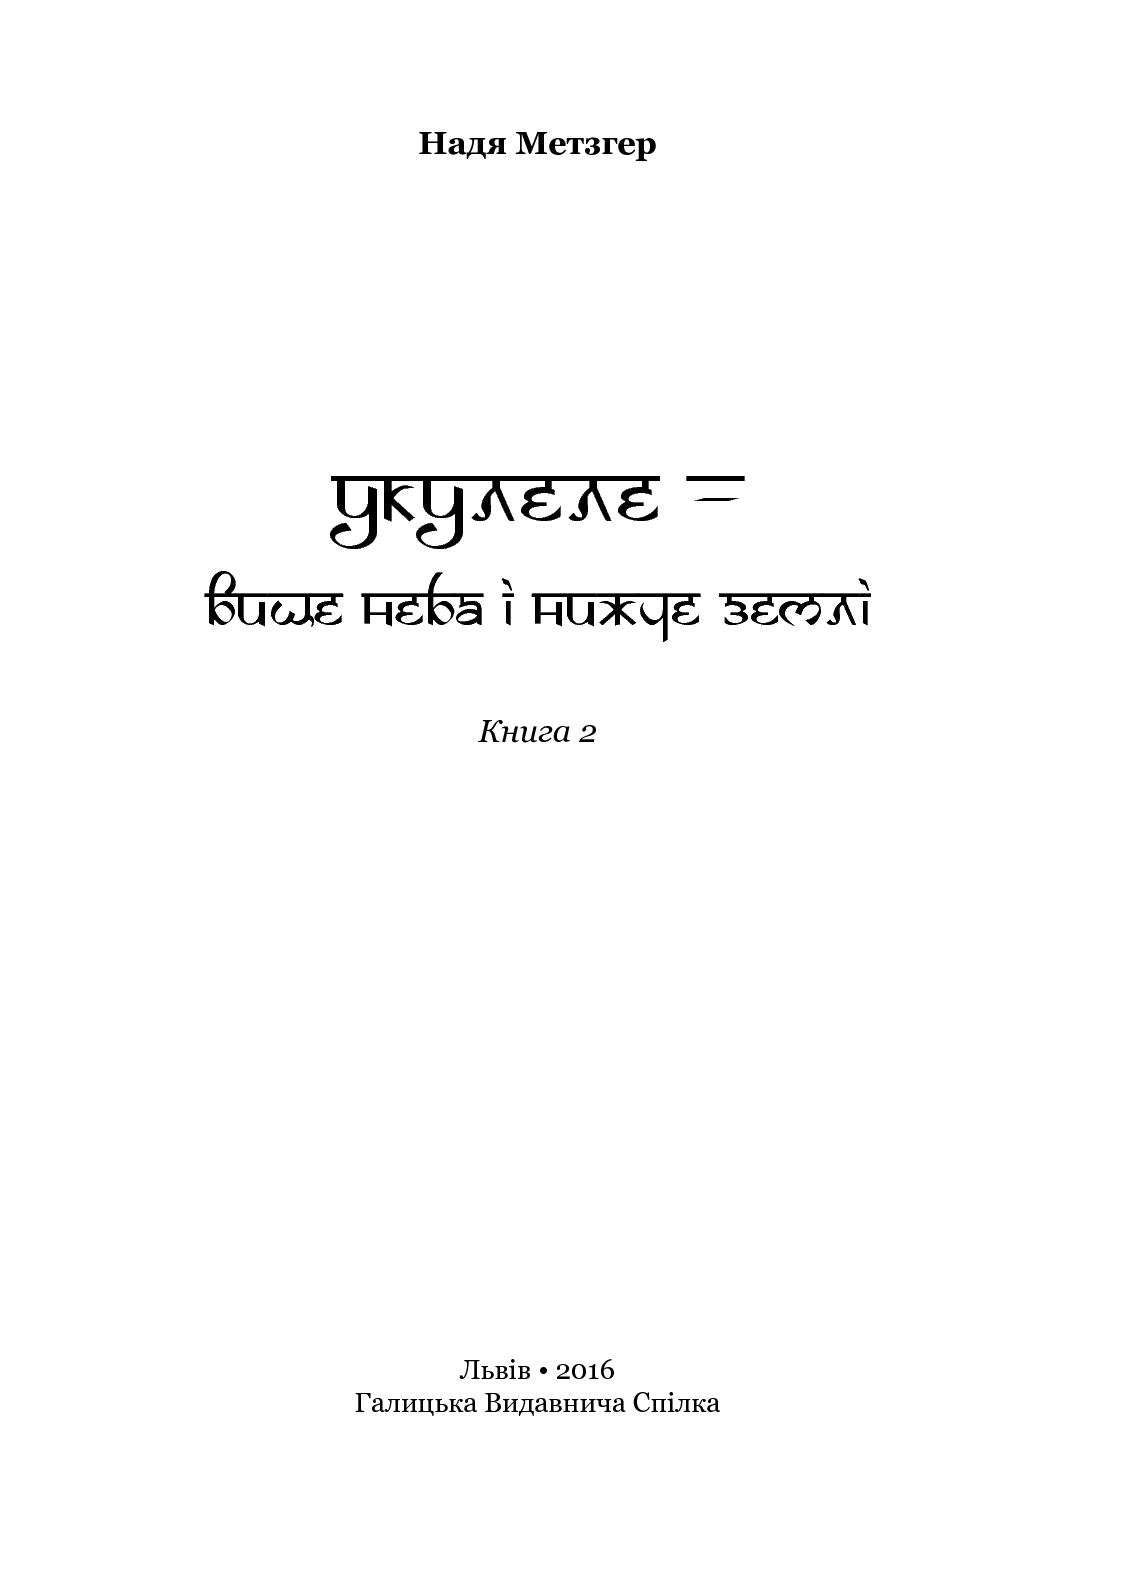 Calaméo - Надя Метзгер. УКУЛЕЛЕ — Вище неба і нижче землі. Книга 2. faa2804f6ff12